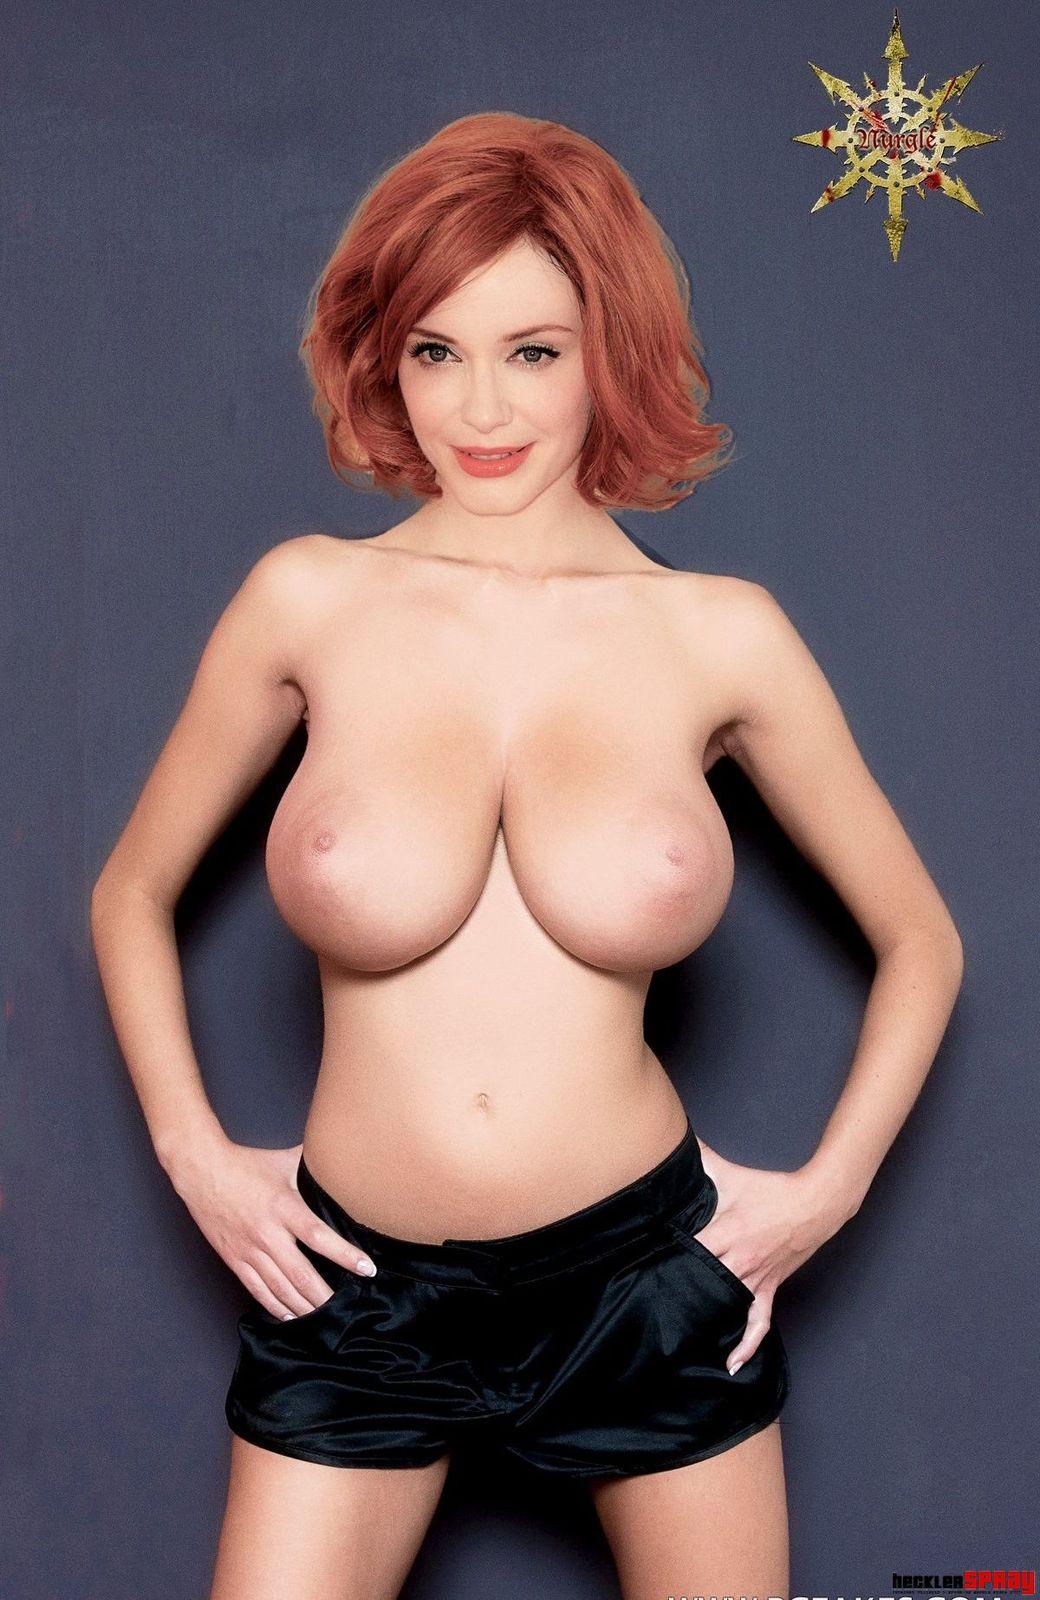 Latina chick naked hd